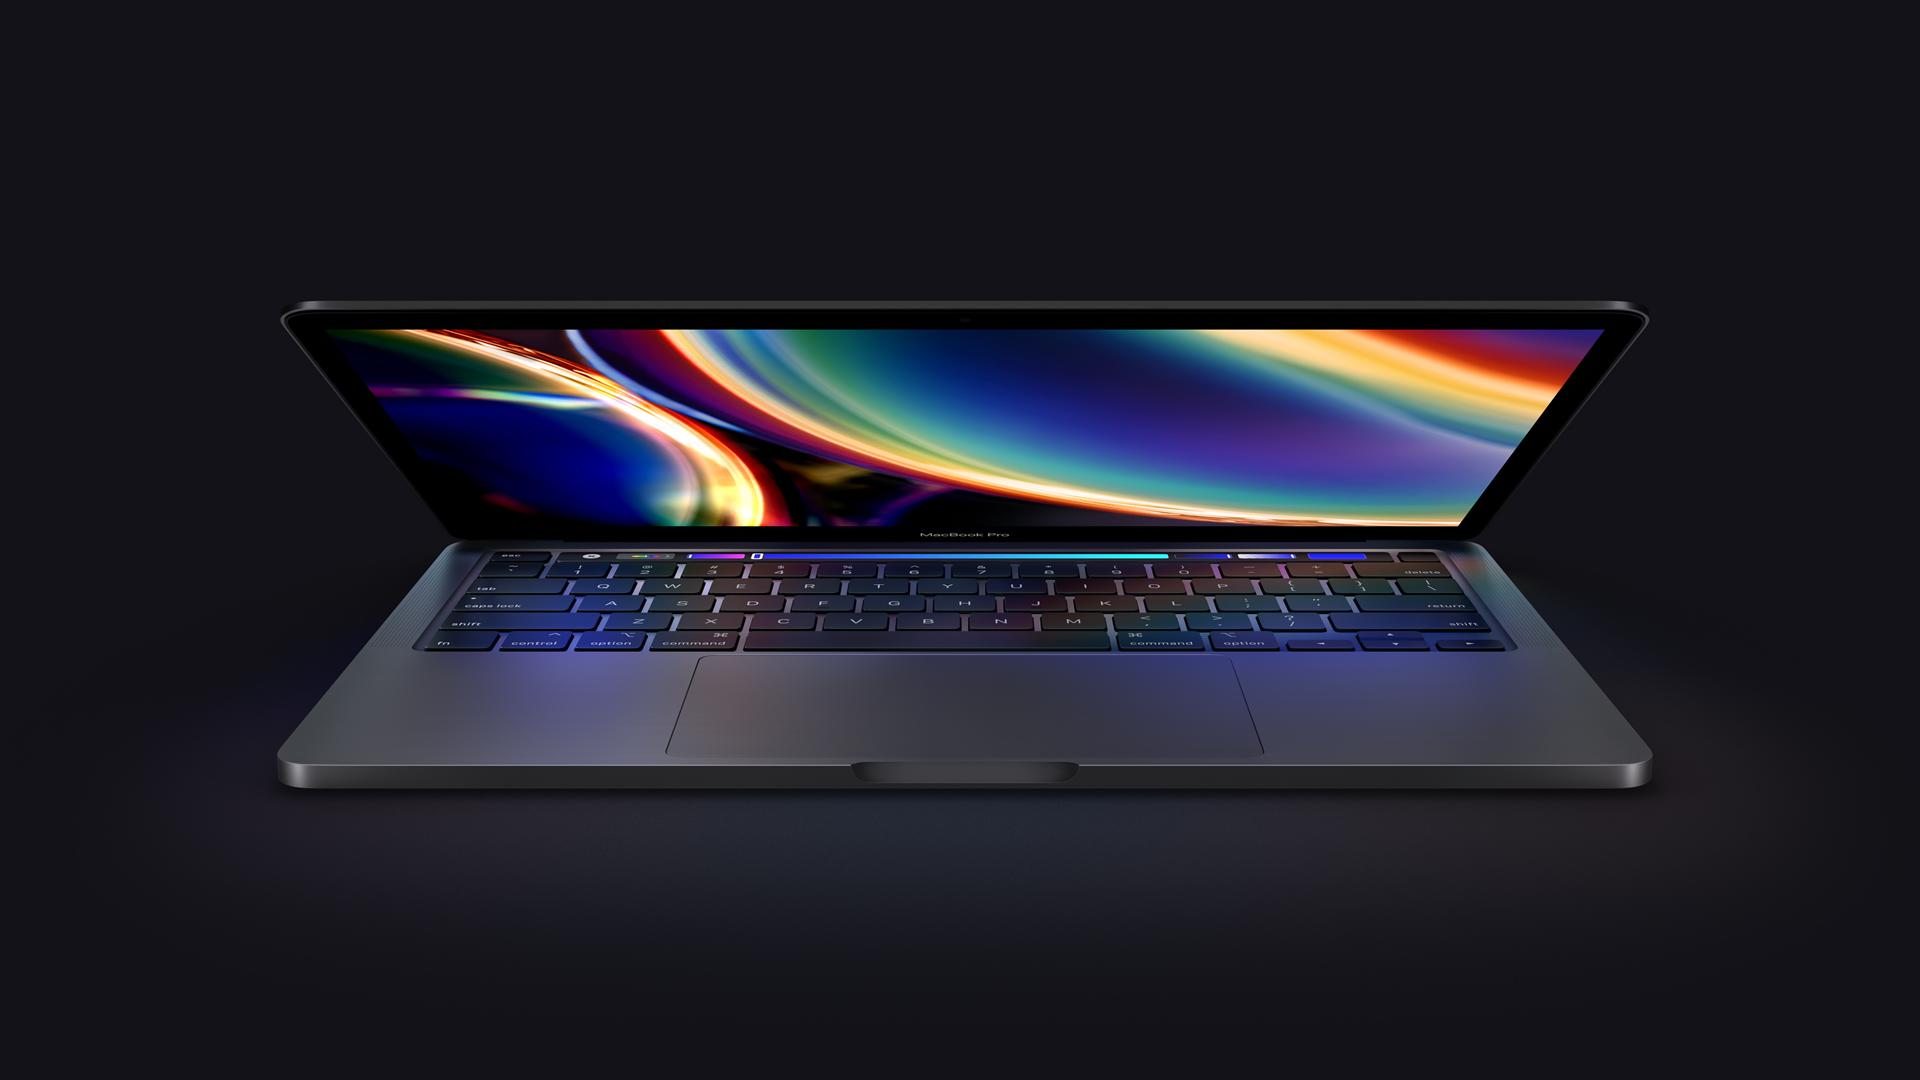 Apple's new 13-inch MacBook Pro is $100 off in today's best deals, plus iPhones from $40, more